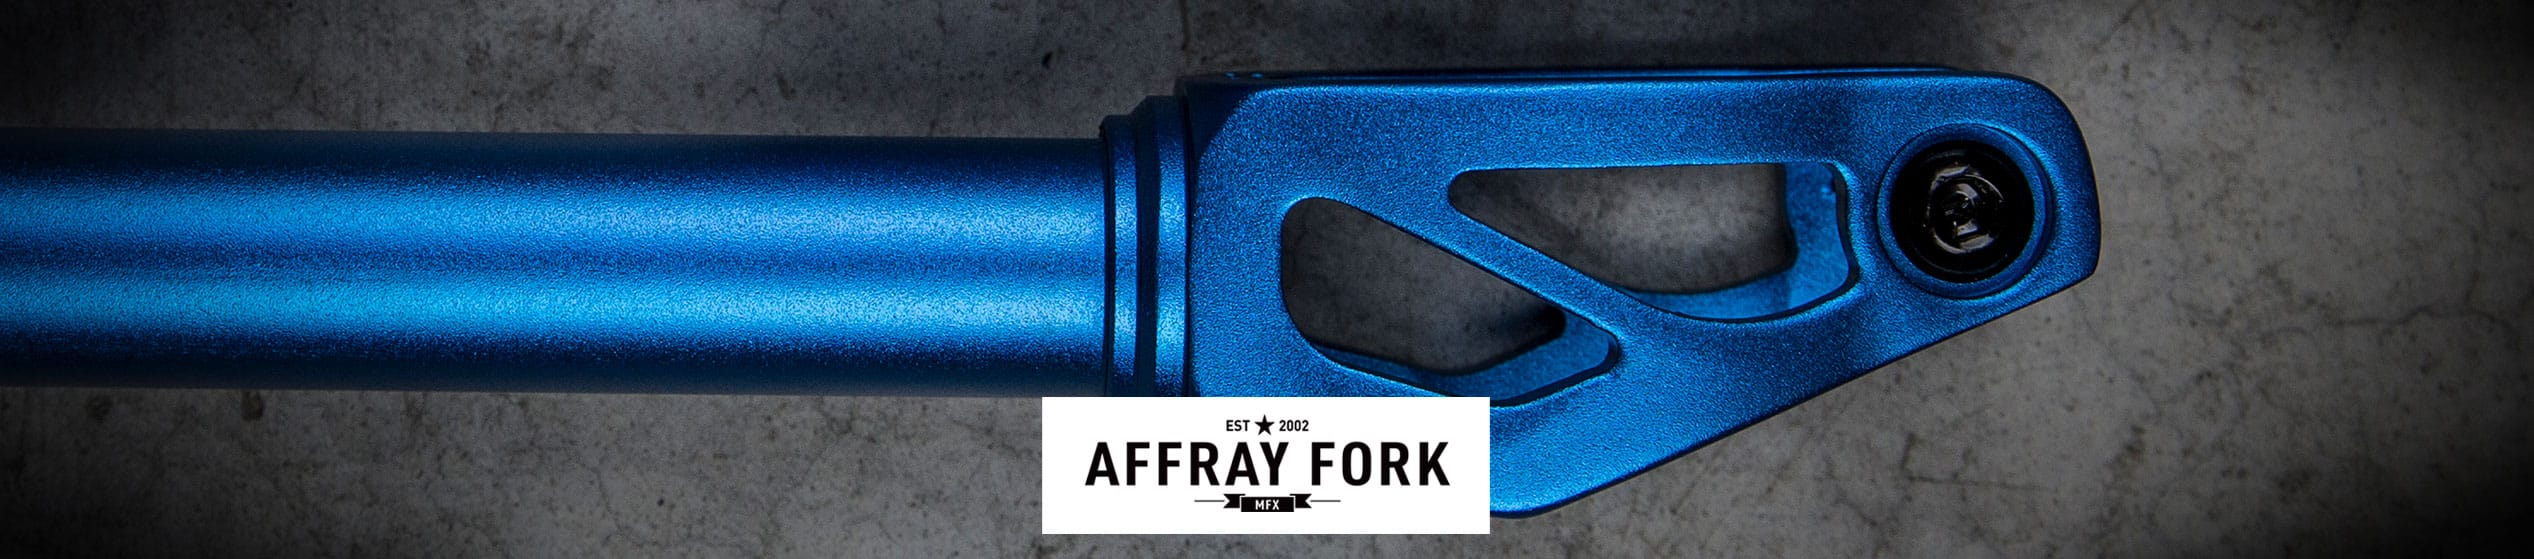 MFX Headset schwarz MGP Madd Gear Stunt-Scooter MFX IHC Fork